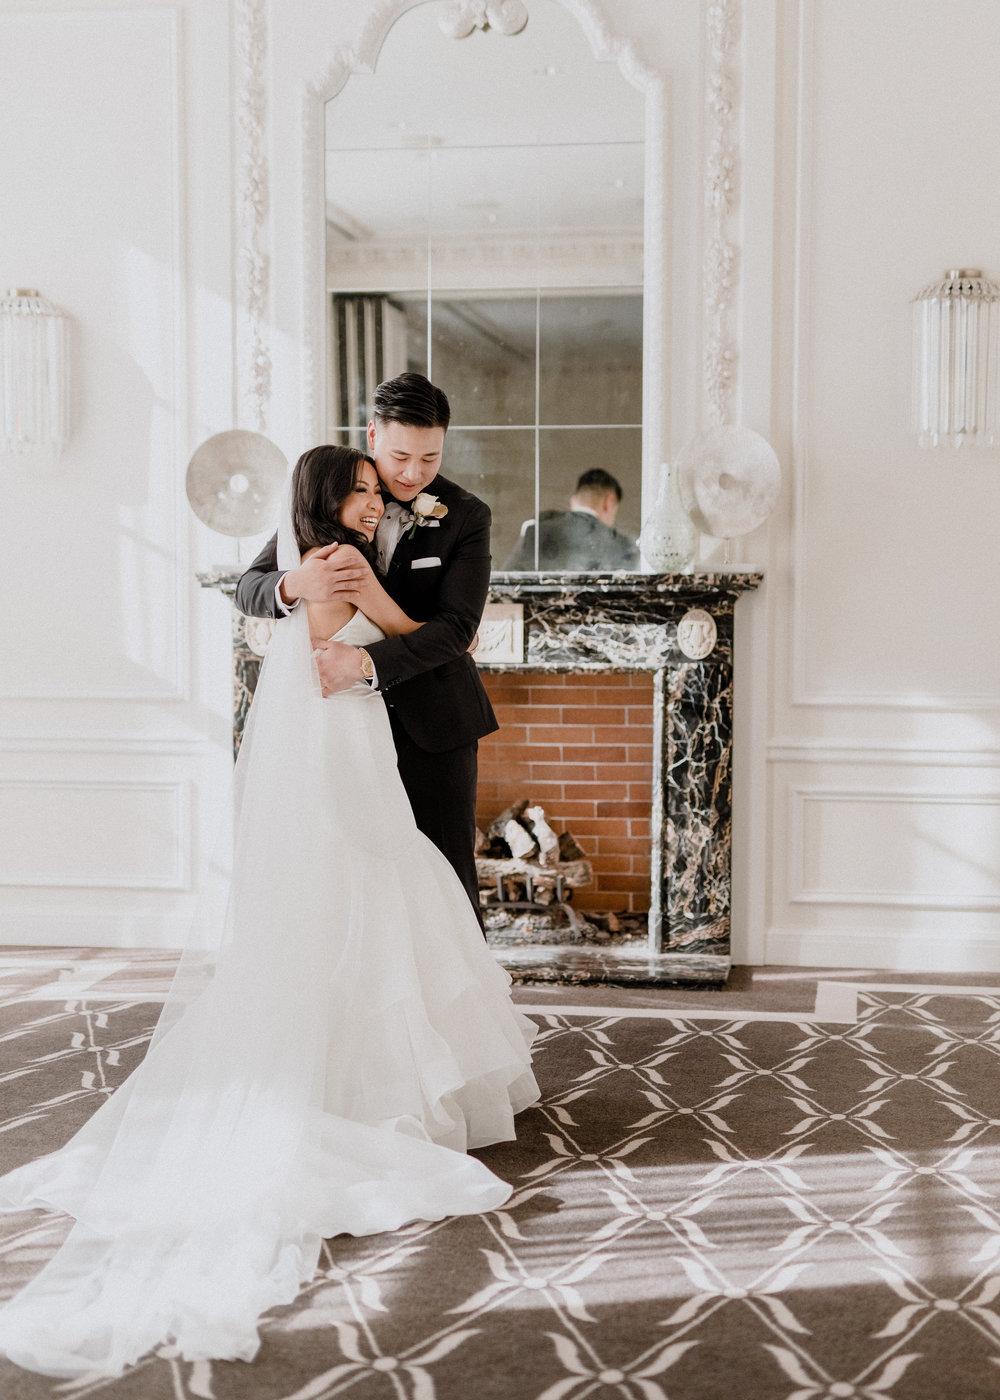 HeraStudios_Selects_Full_KatrinaAndrew_Wedding_Version2-211.jpg